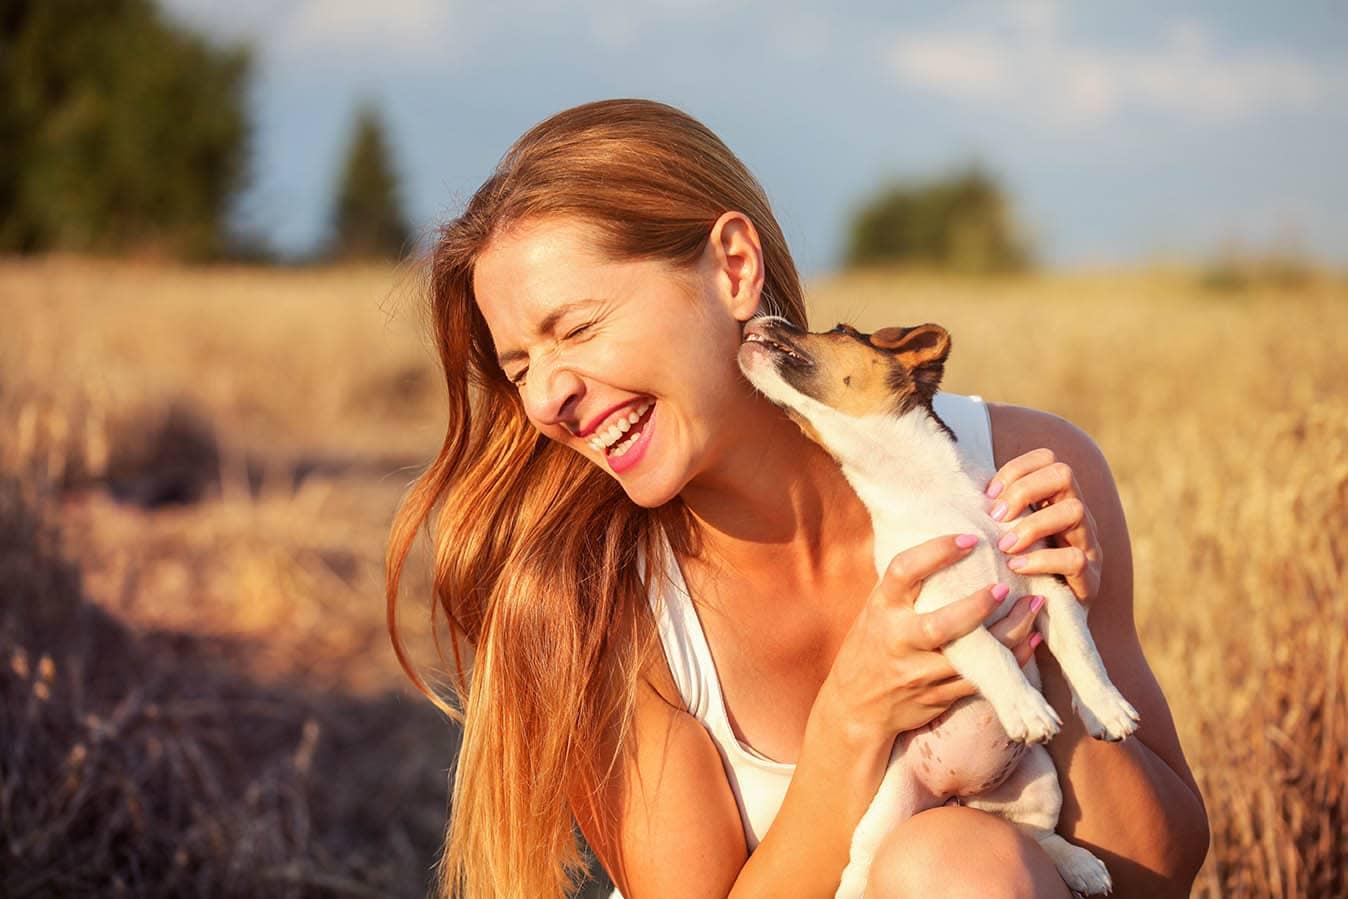 Dog licking woman's ear